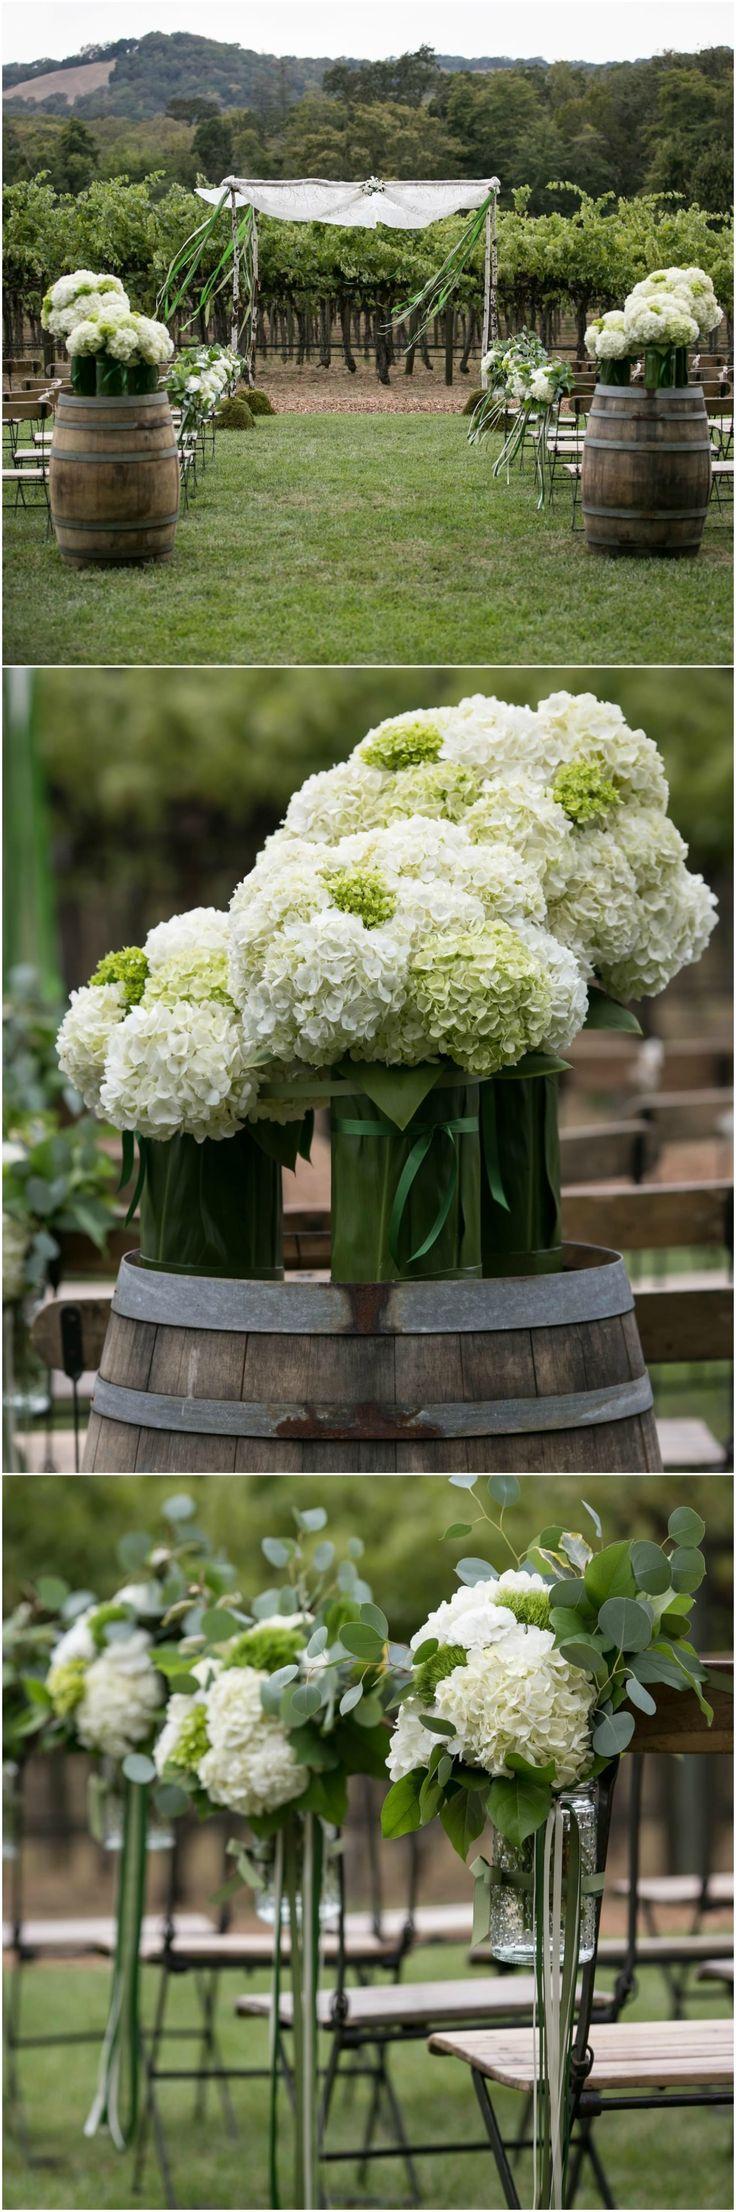 Winery wedding, rustic vineyard, outdoor ceremony, white hydrangeas, wine barrels, green & ivory ribbons // Arrowood Photography